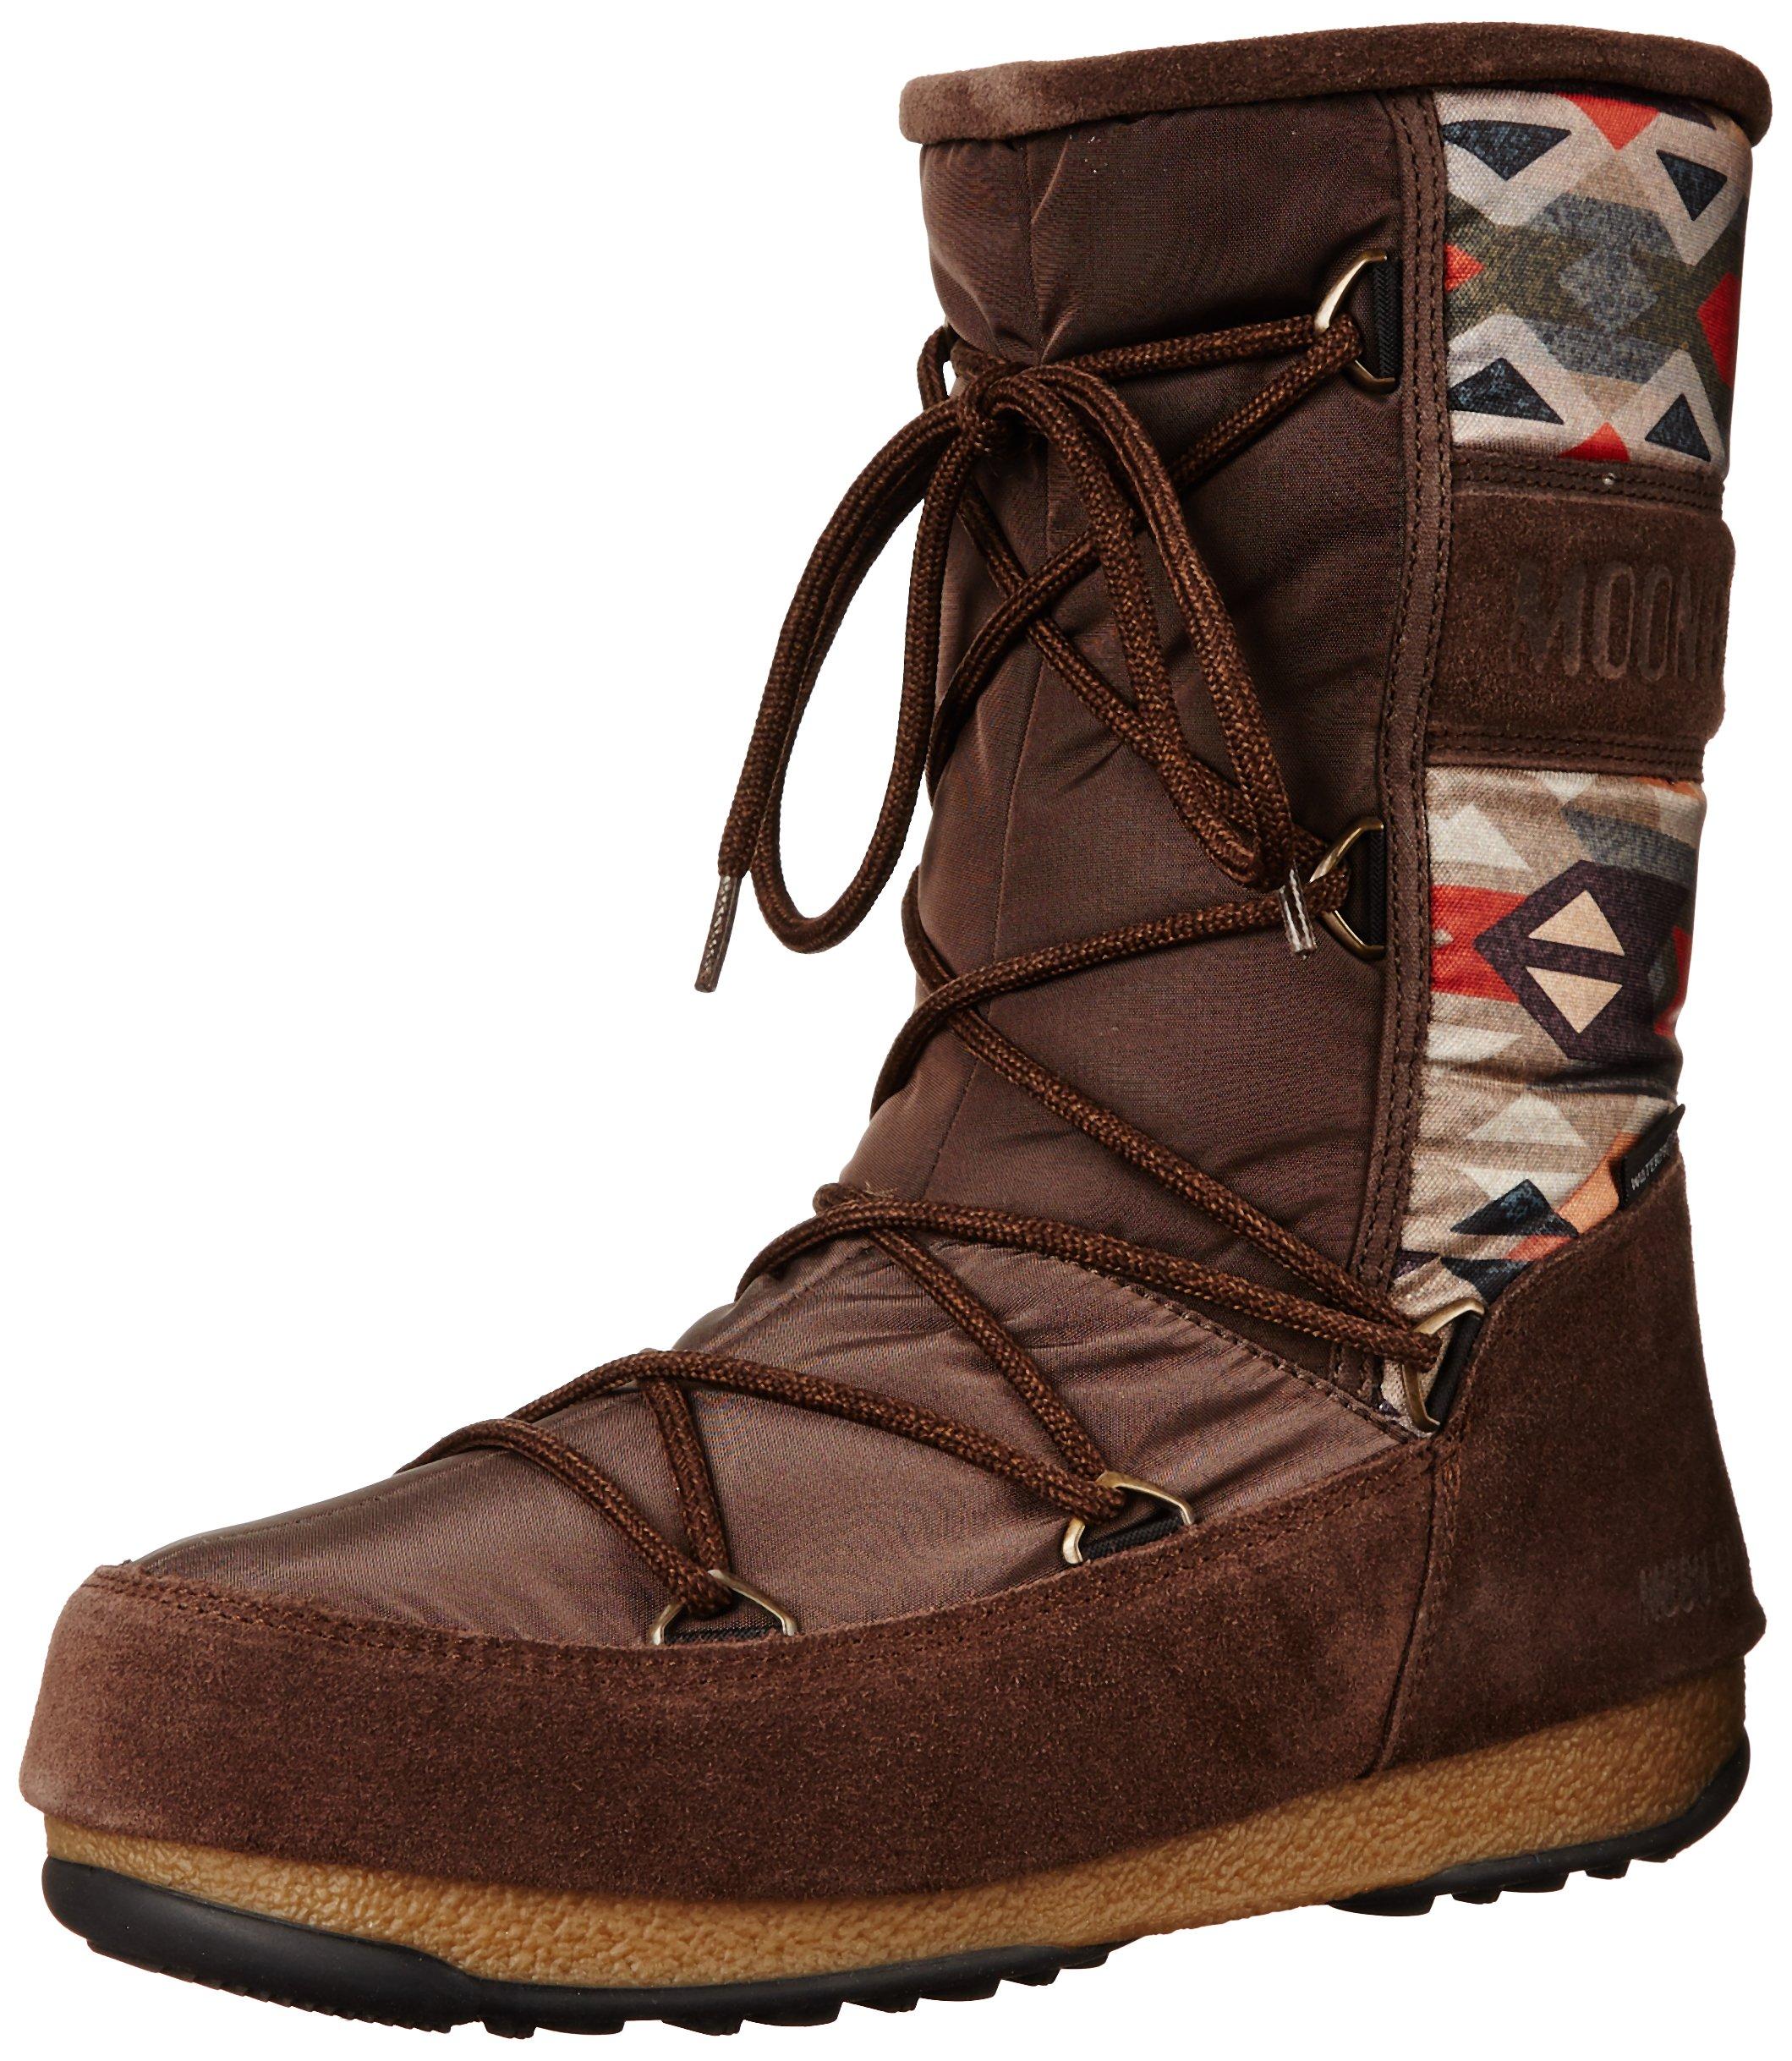 Tecnica Women's Moon We Vienna Native Winter Fashion Boot, Brown, 40 EU/8.5 M US